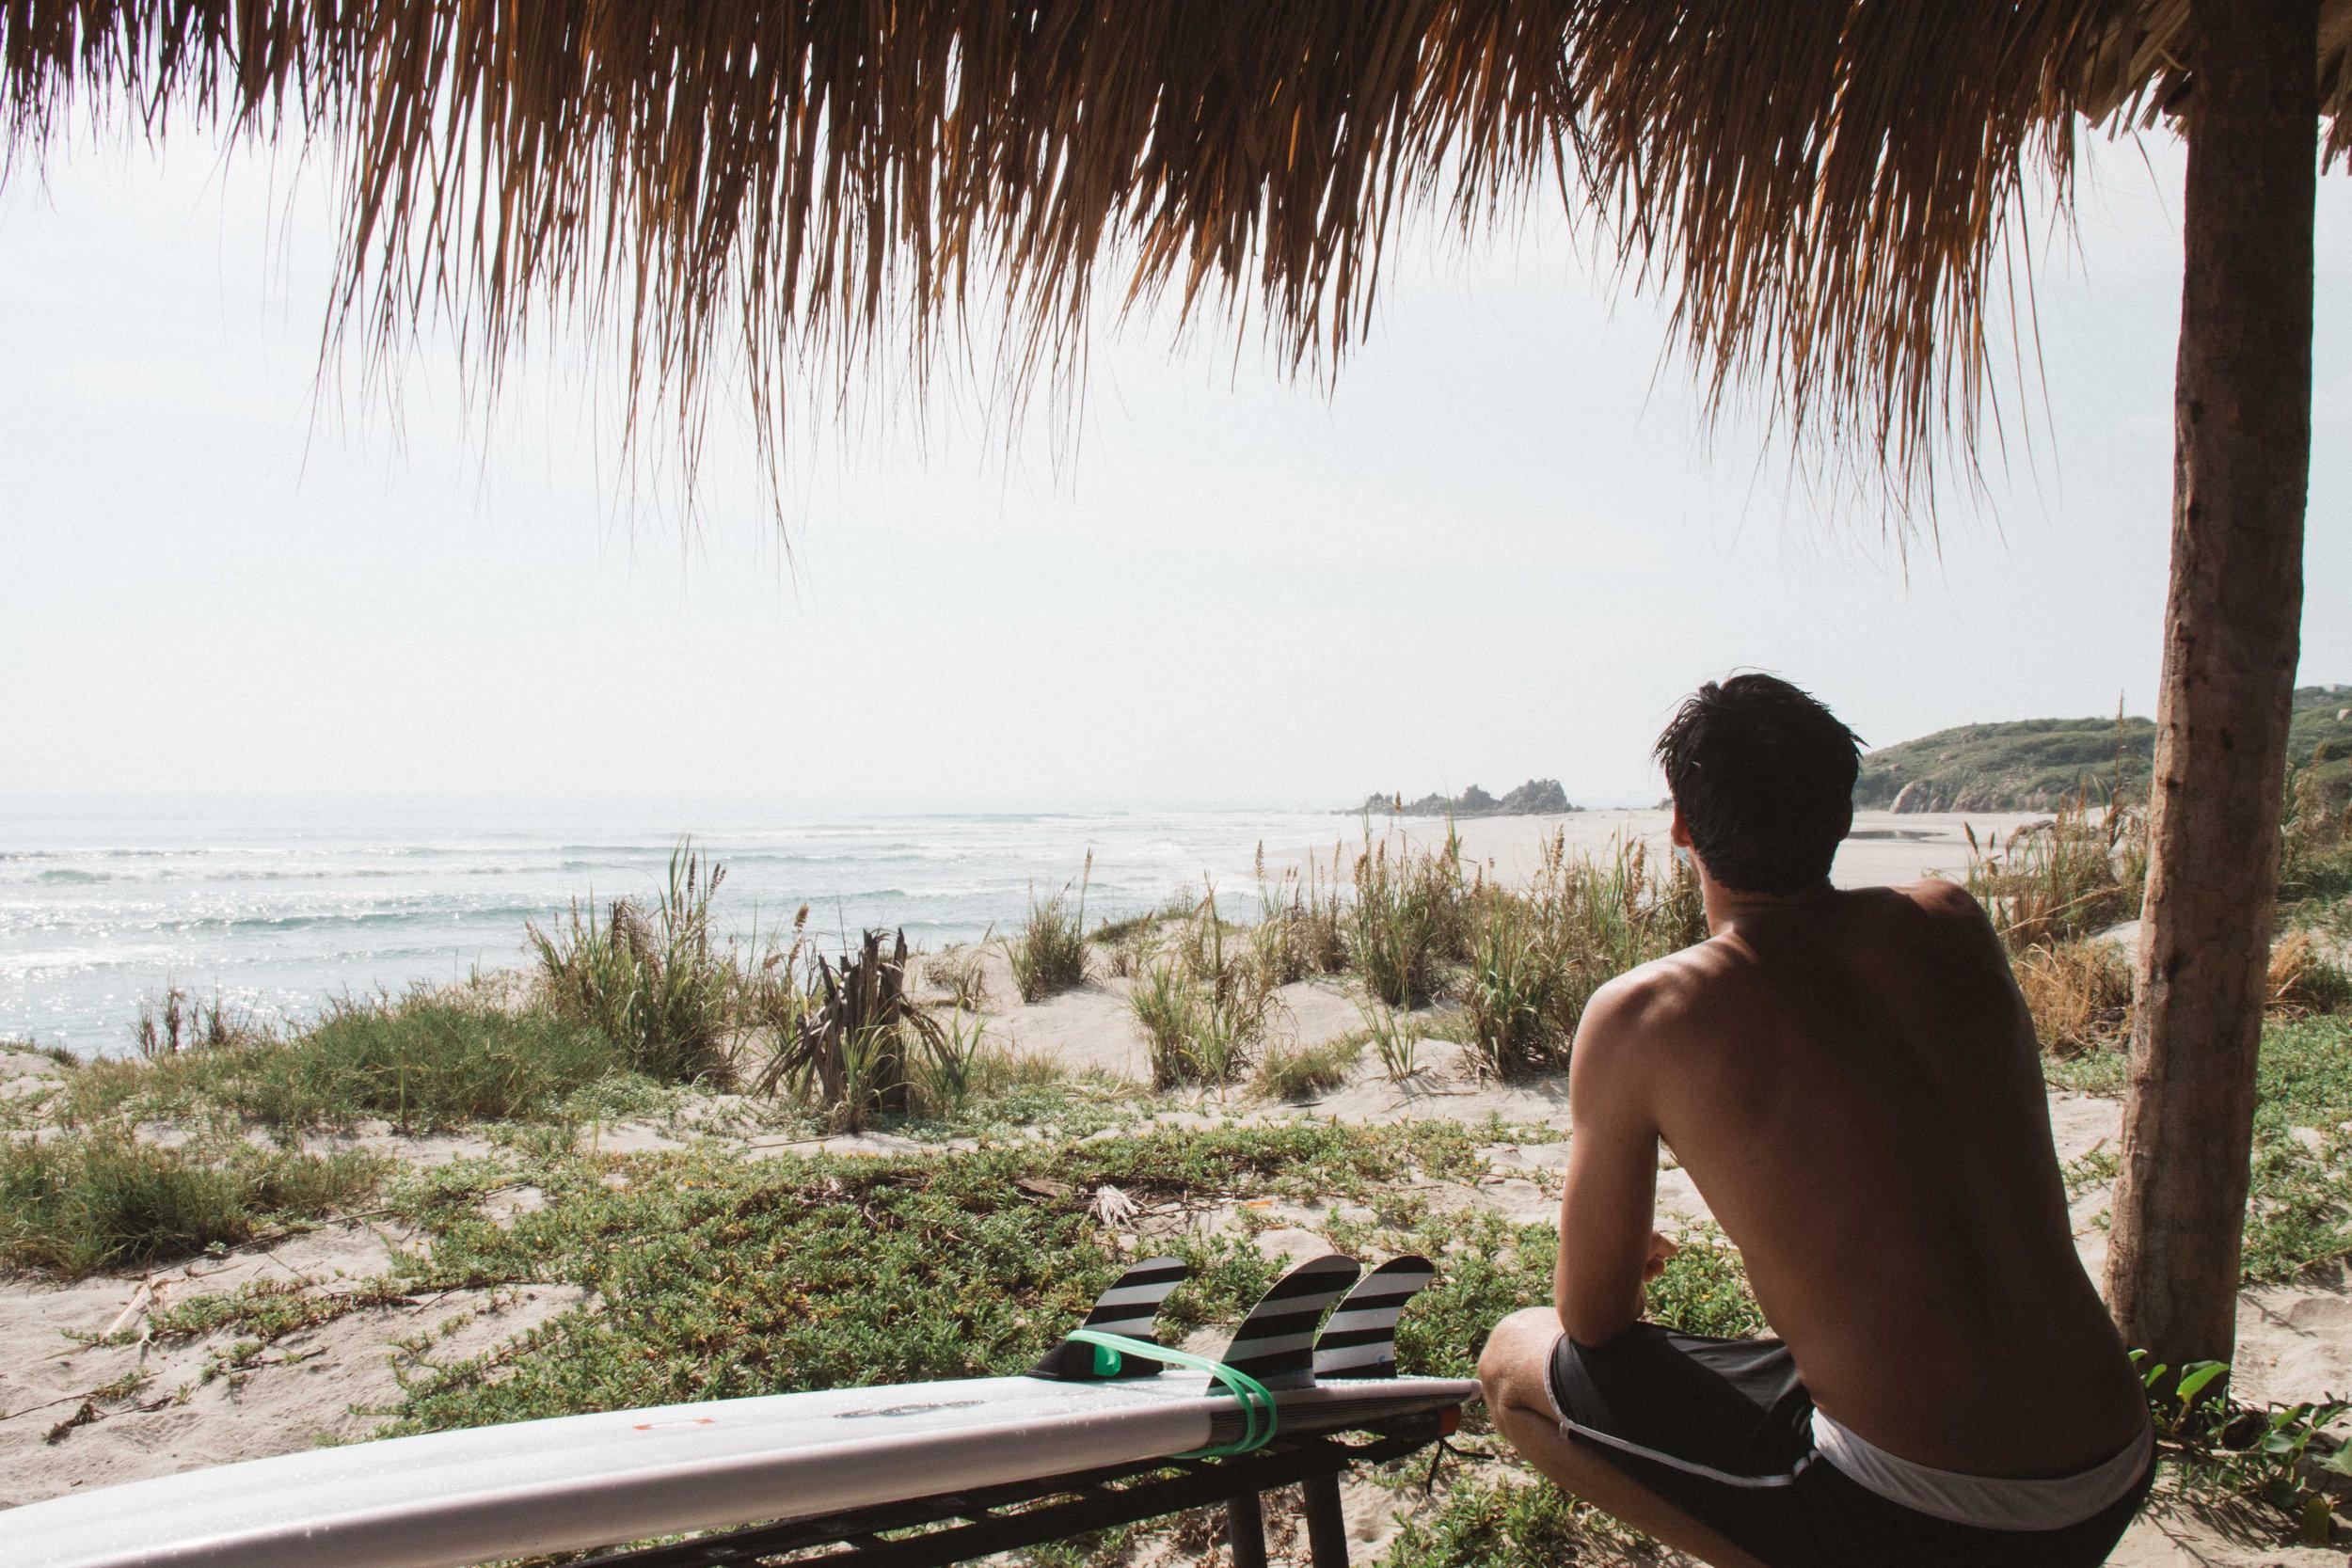 captainbarto-blog-adambartoshesky-model-nautica-client-mexico-surf-trip-mexican-mirage-september-2018-1277798.jpg